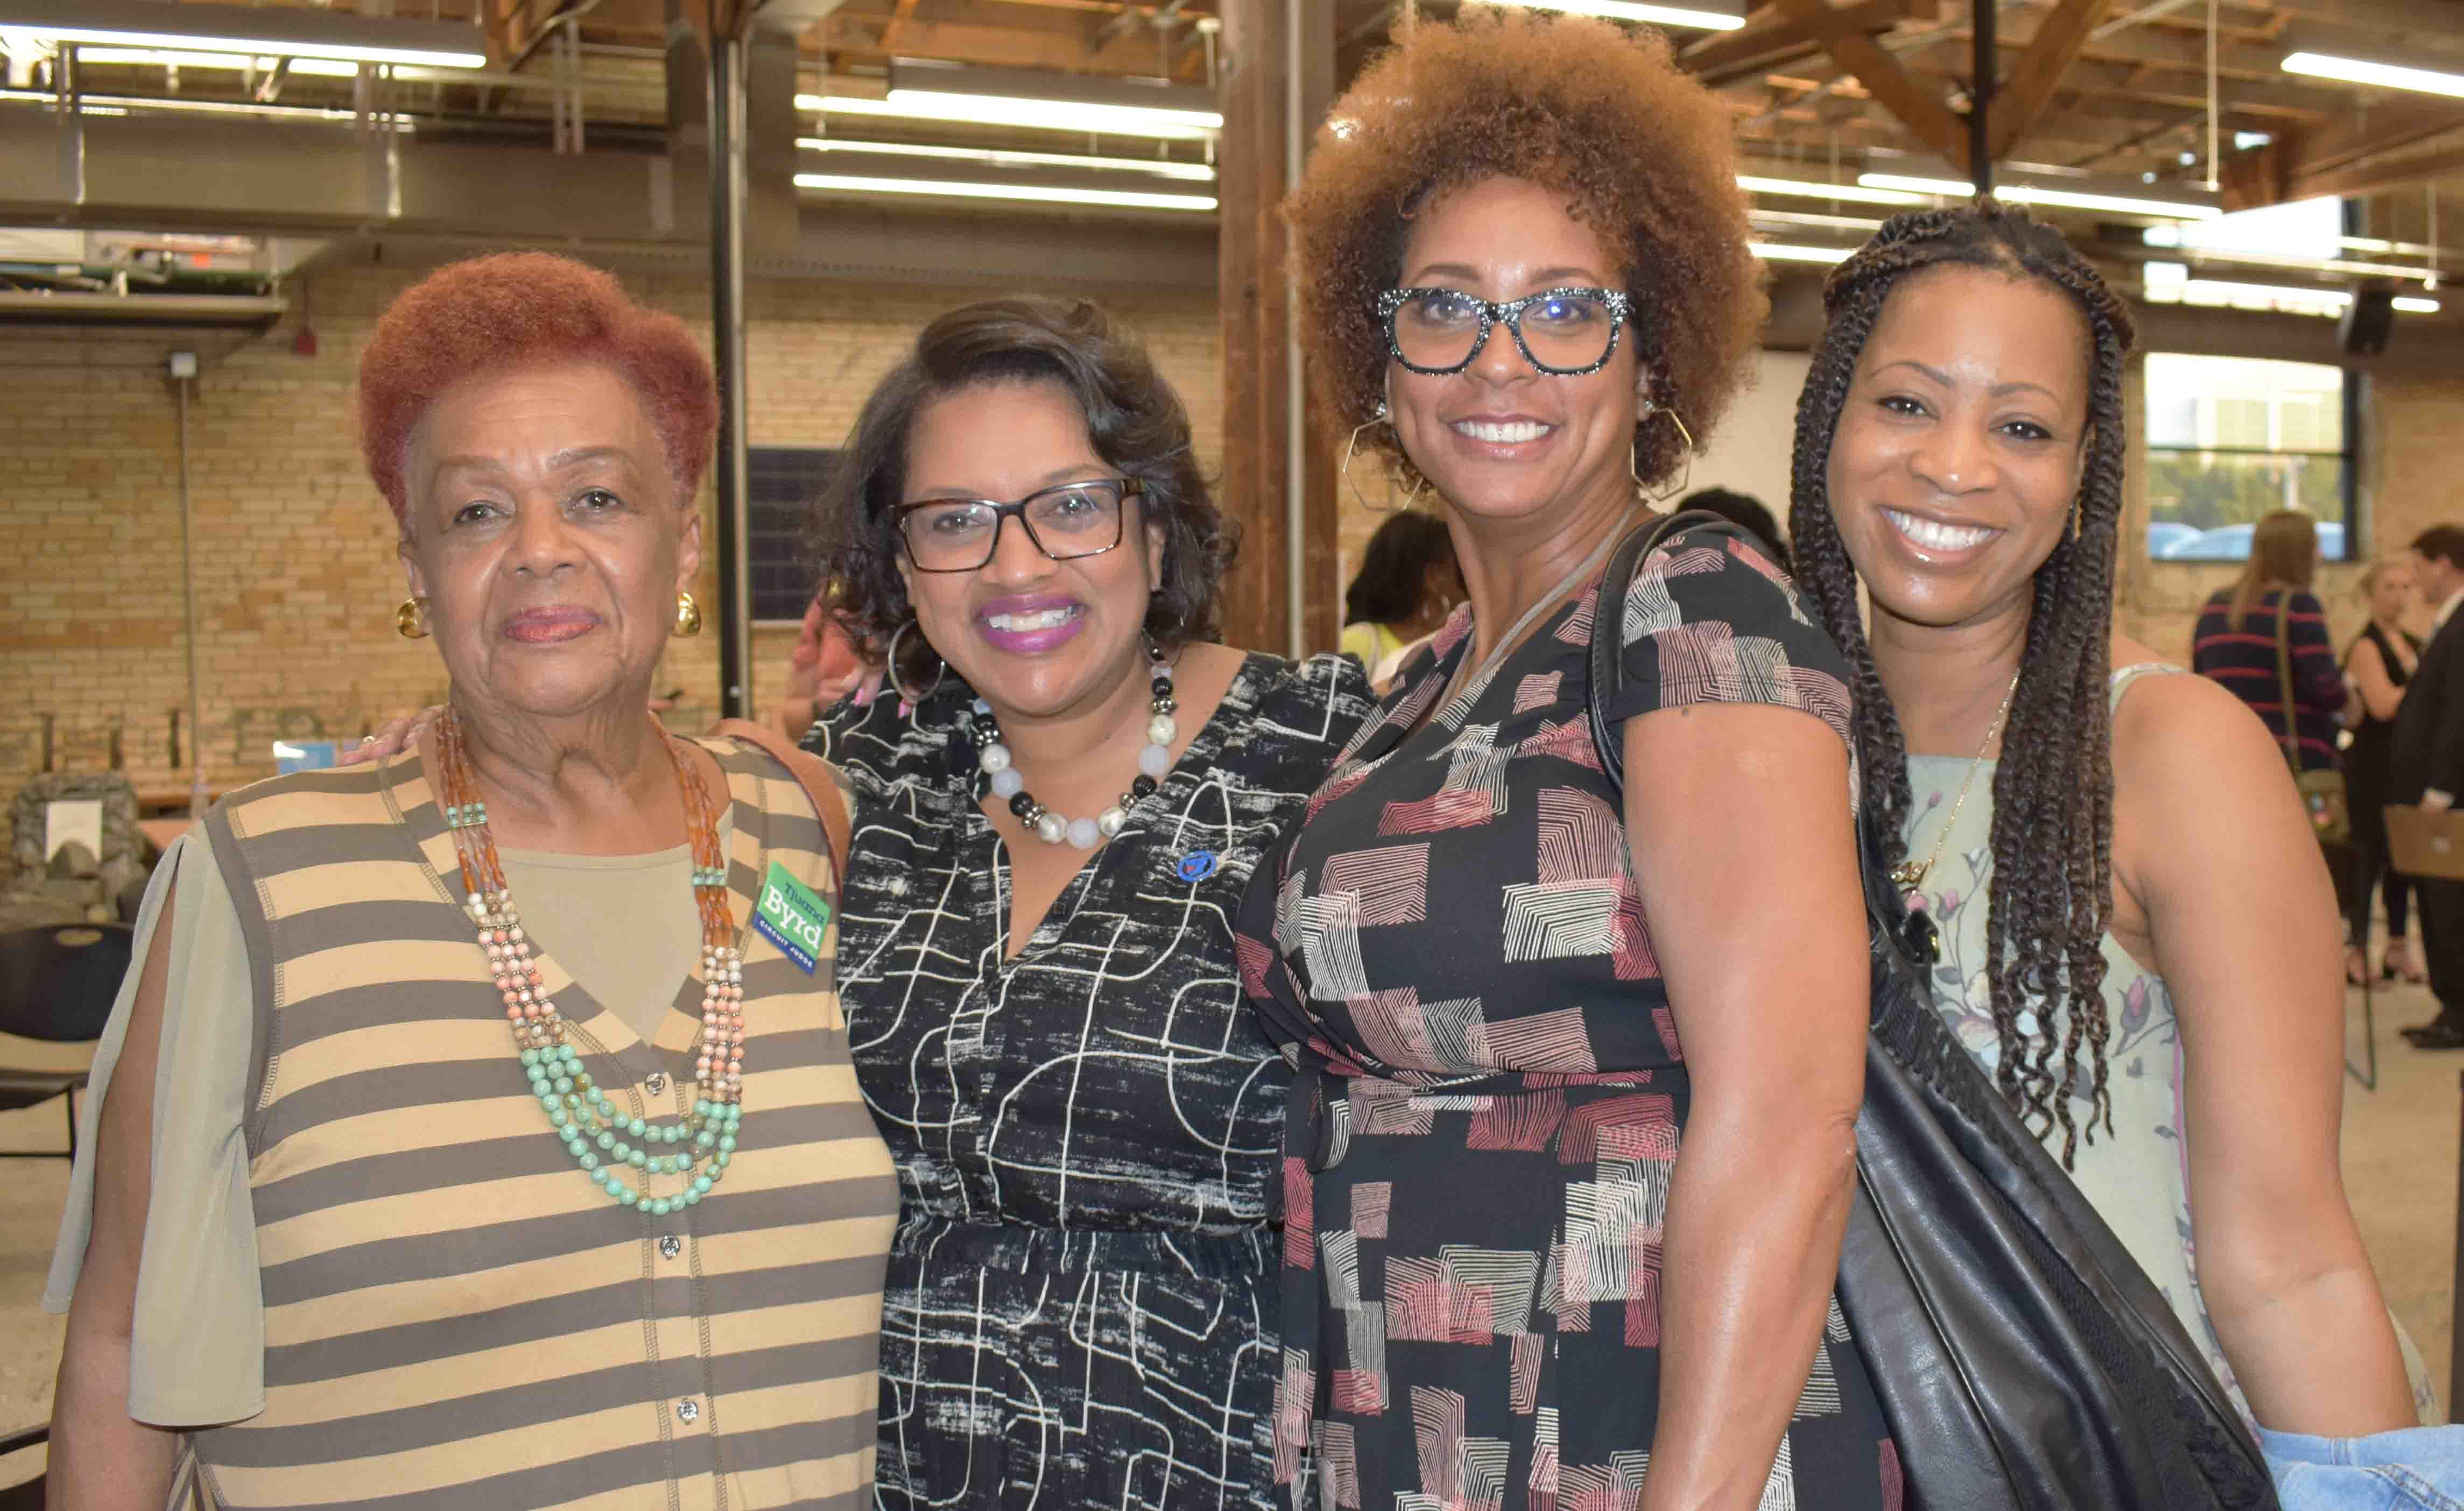 Claudette Votor, Debra Mitchell, Suzanne Ornelas, Faith Seahorn